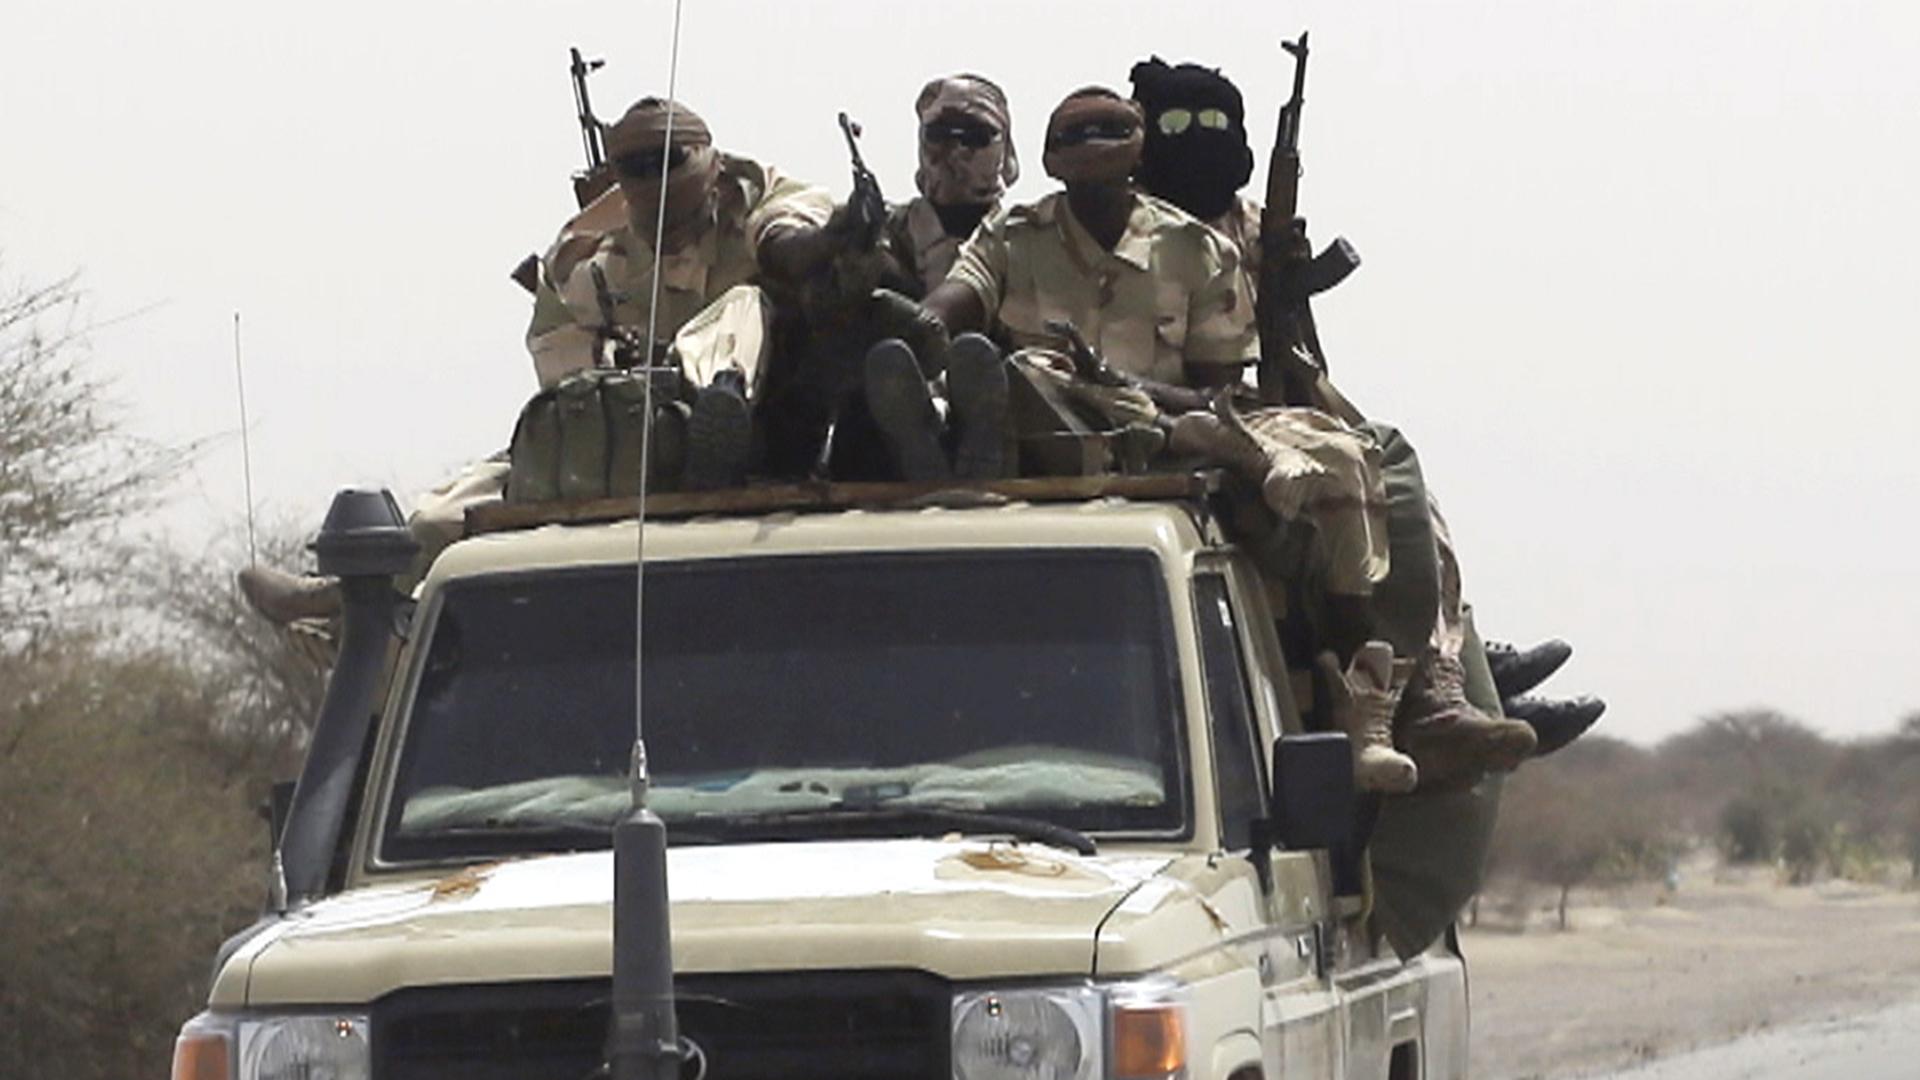 Ansaru: Boko Haram Splinter Group Sows Terror in Nigeria